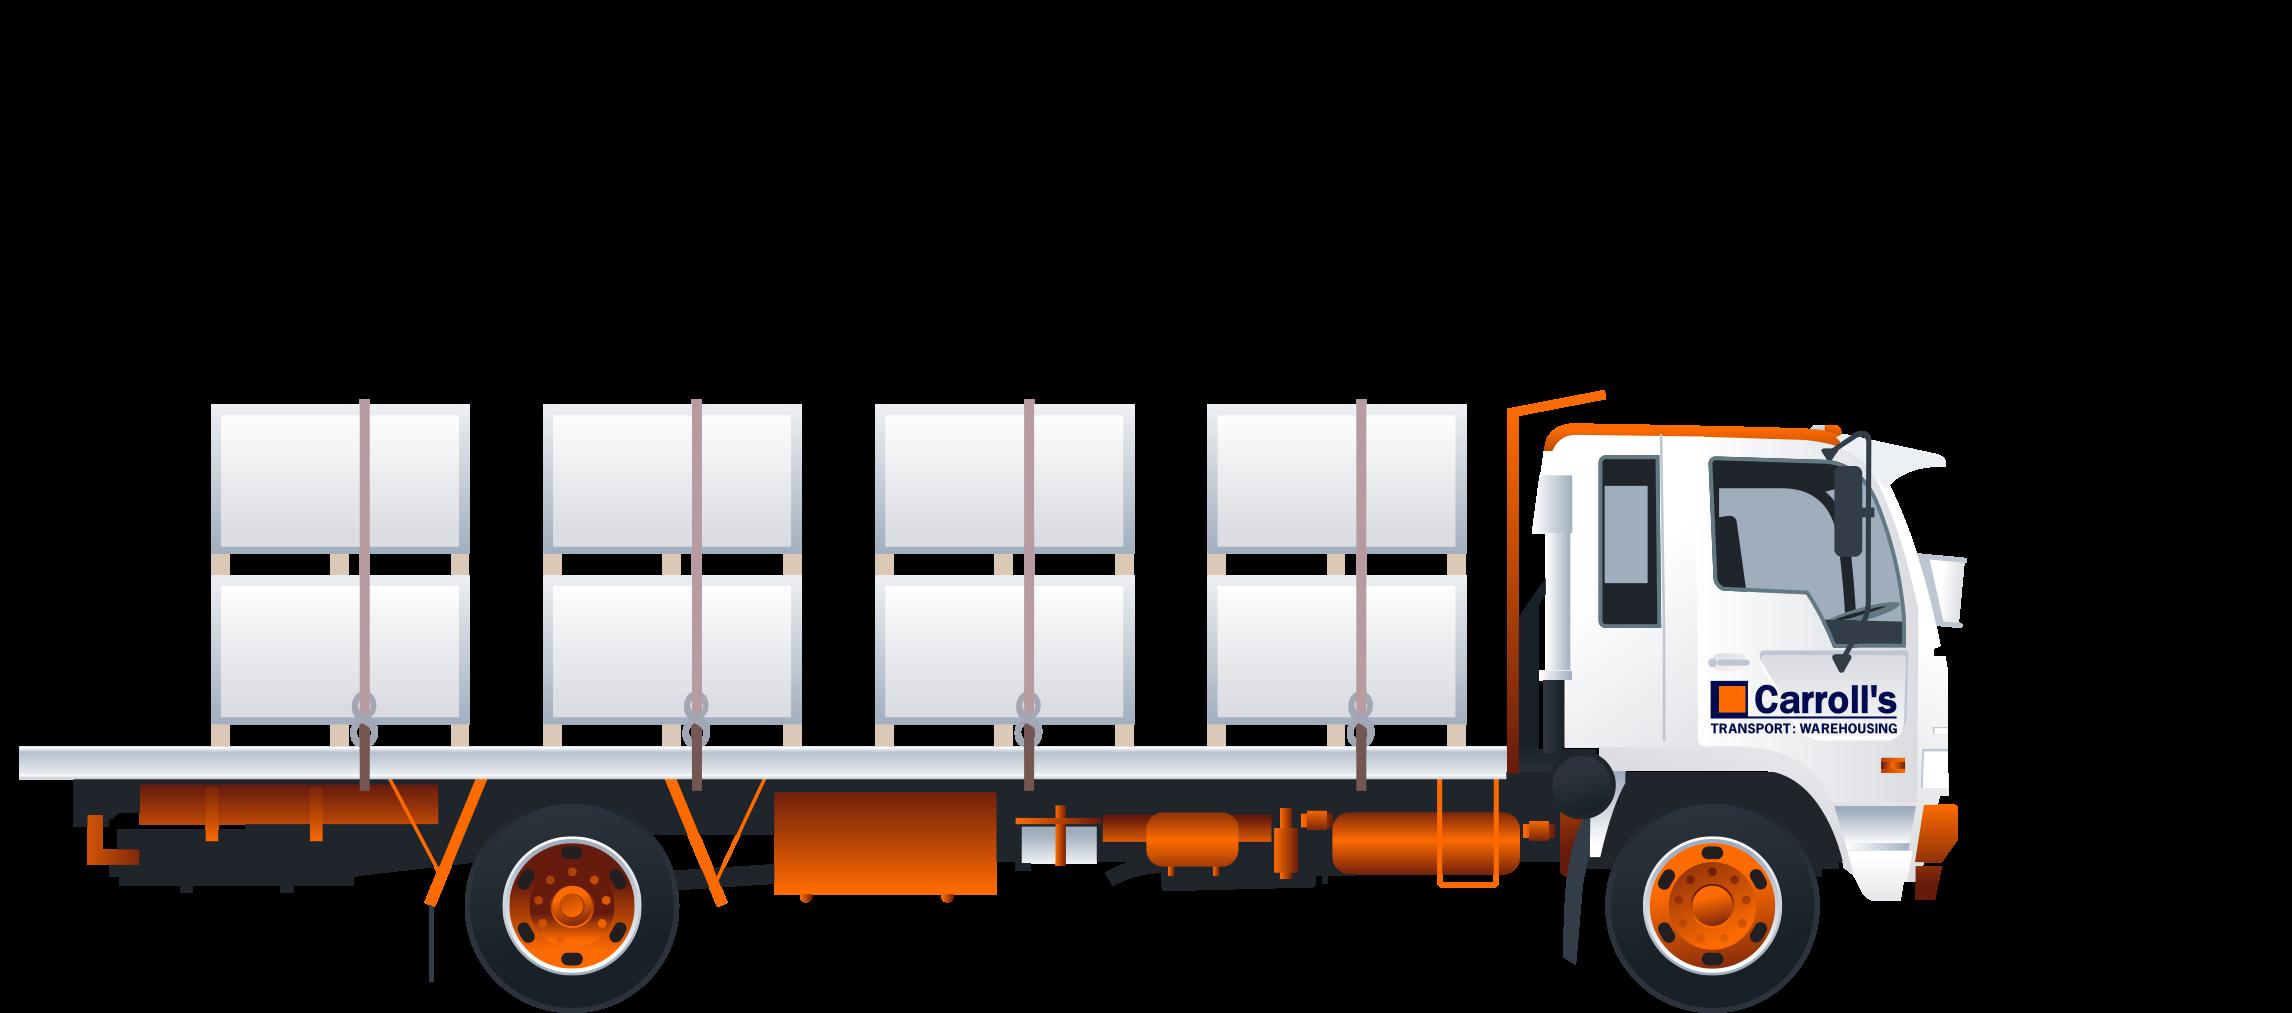 Flatdeck trucks